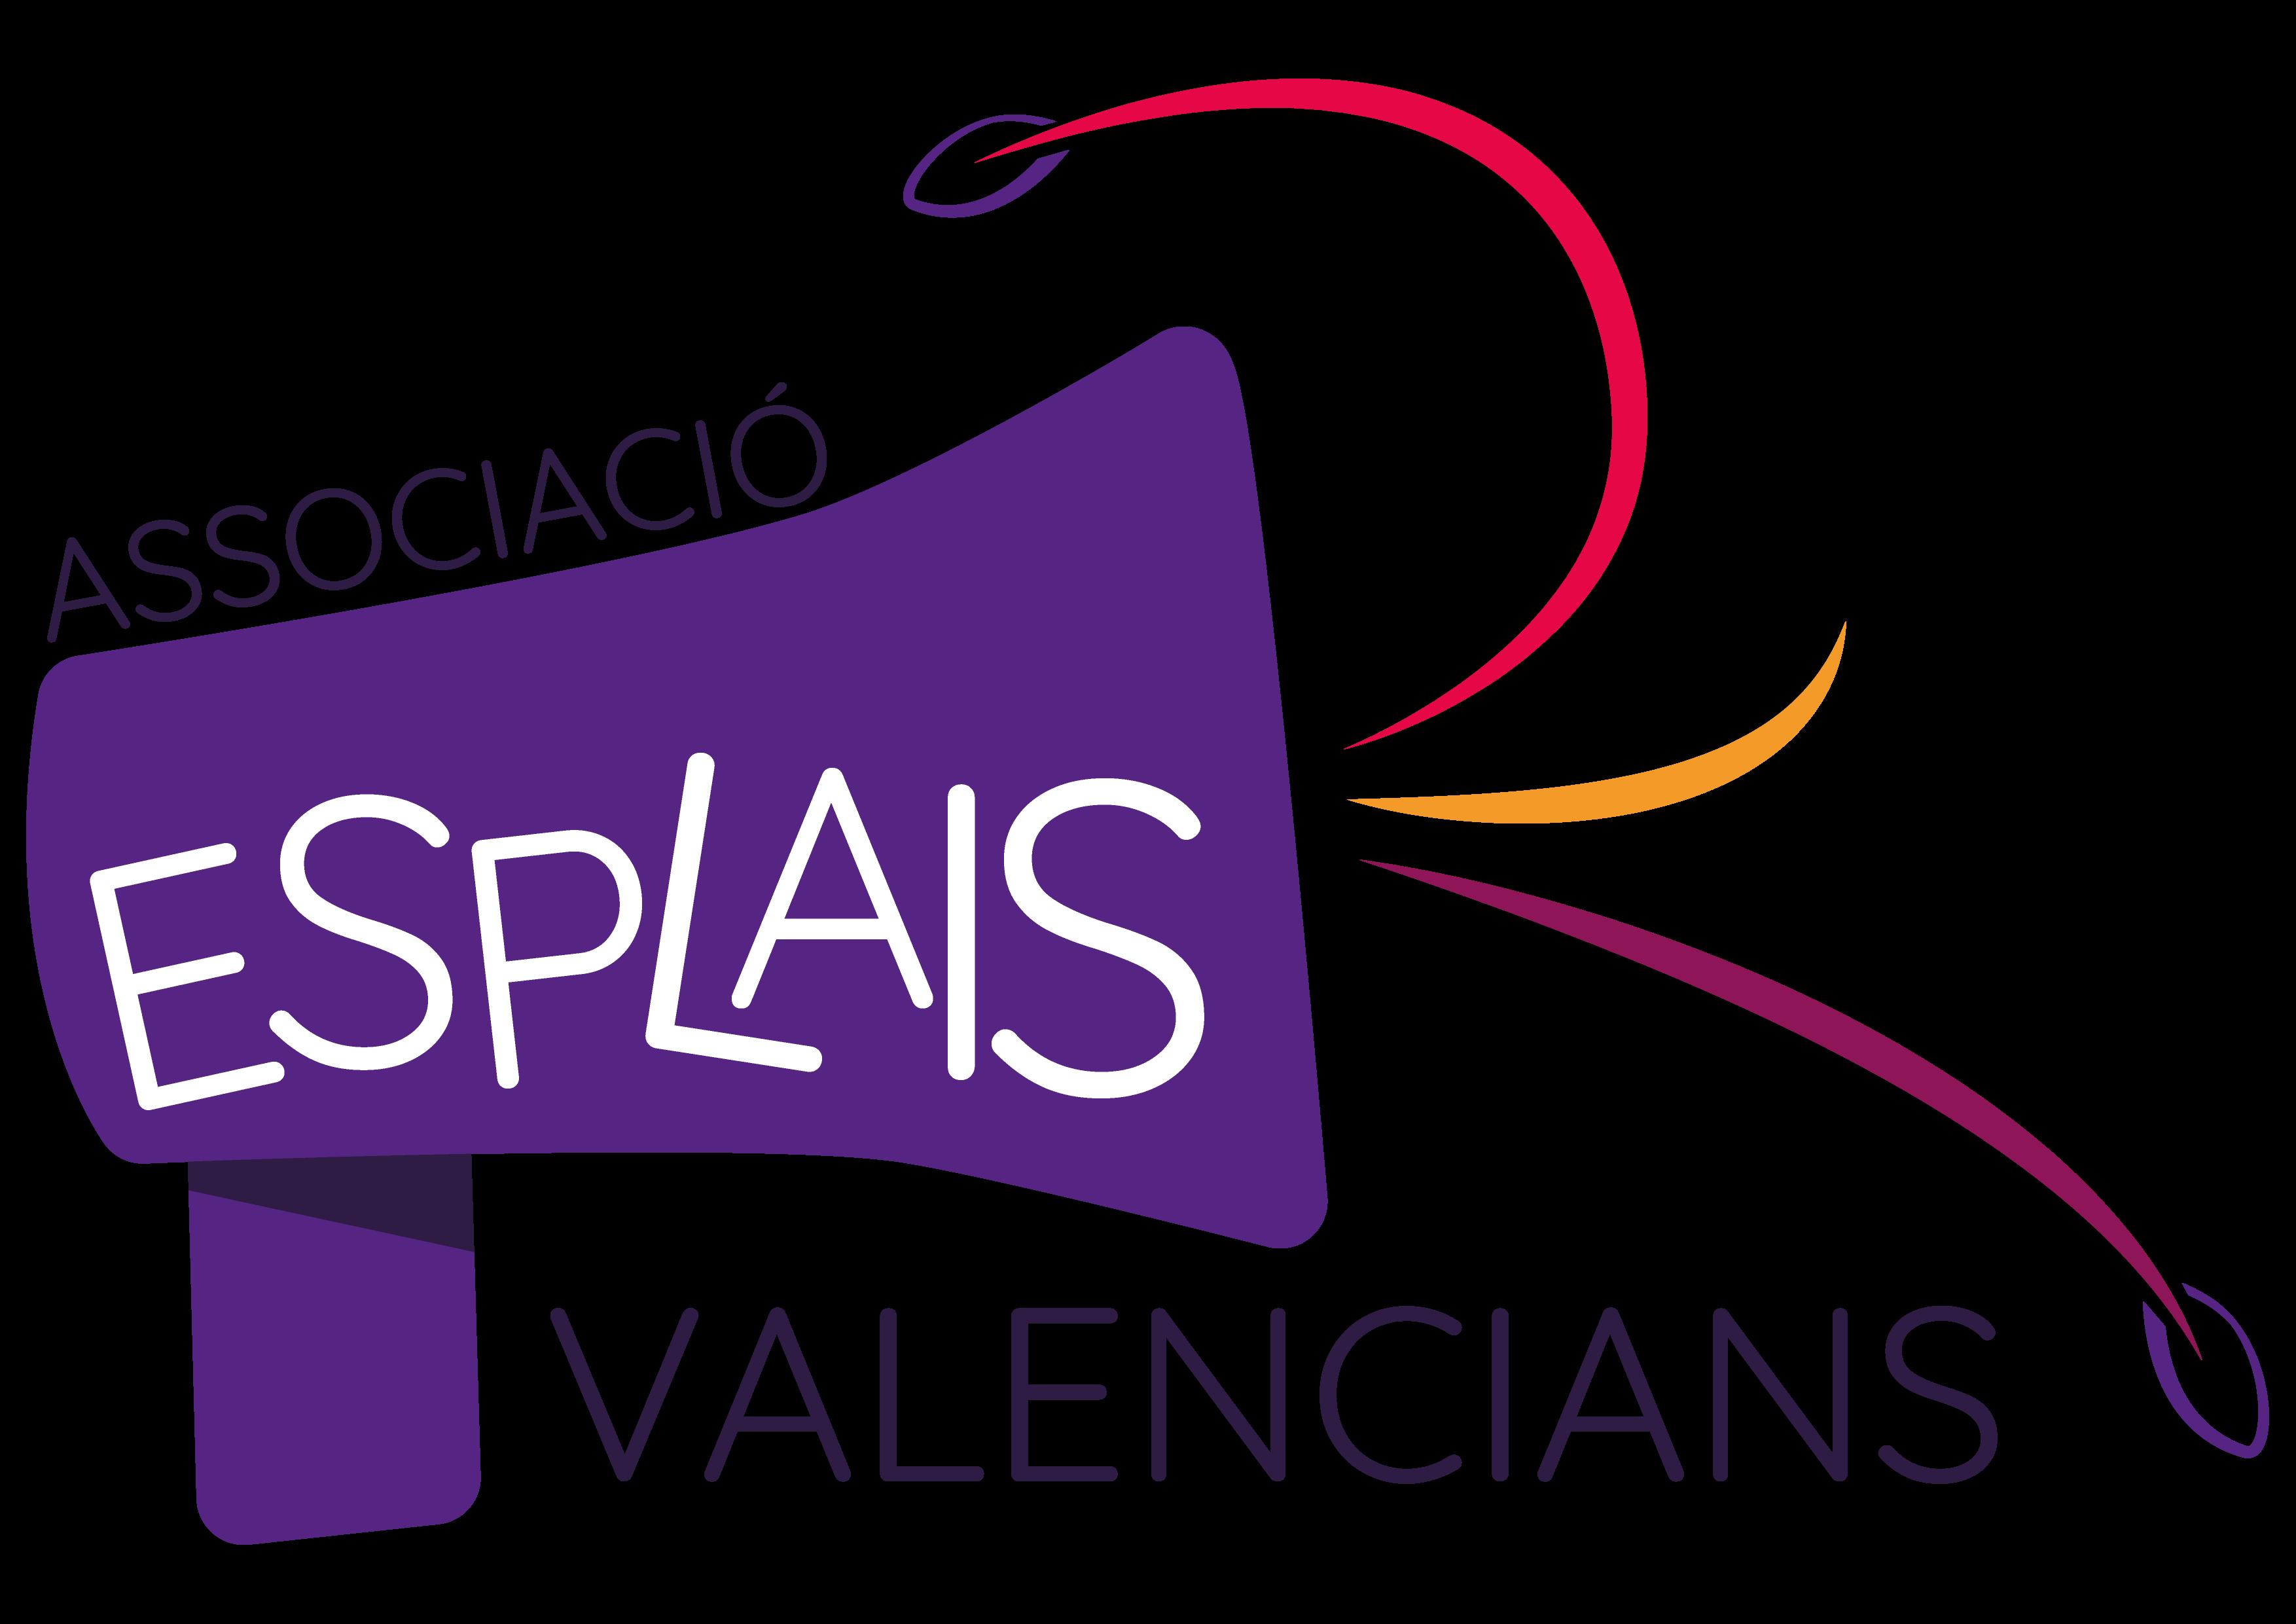 Esplais Valencians